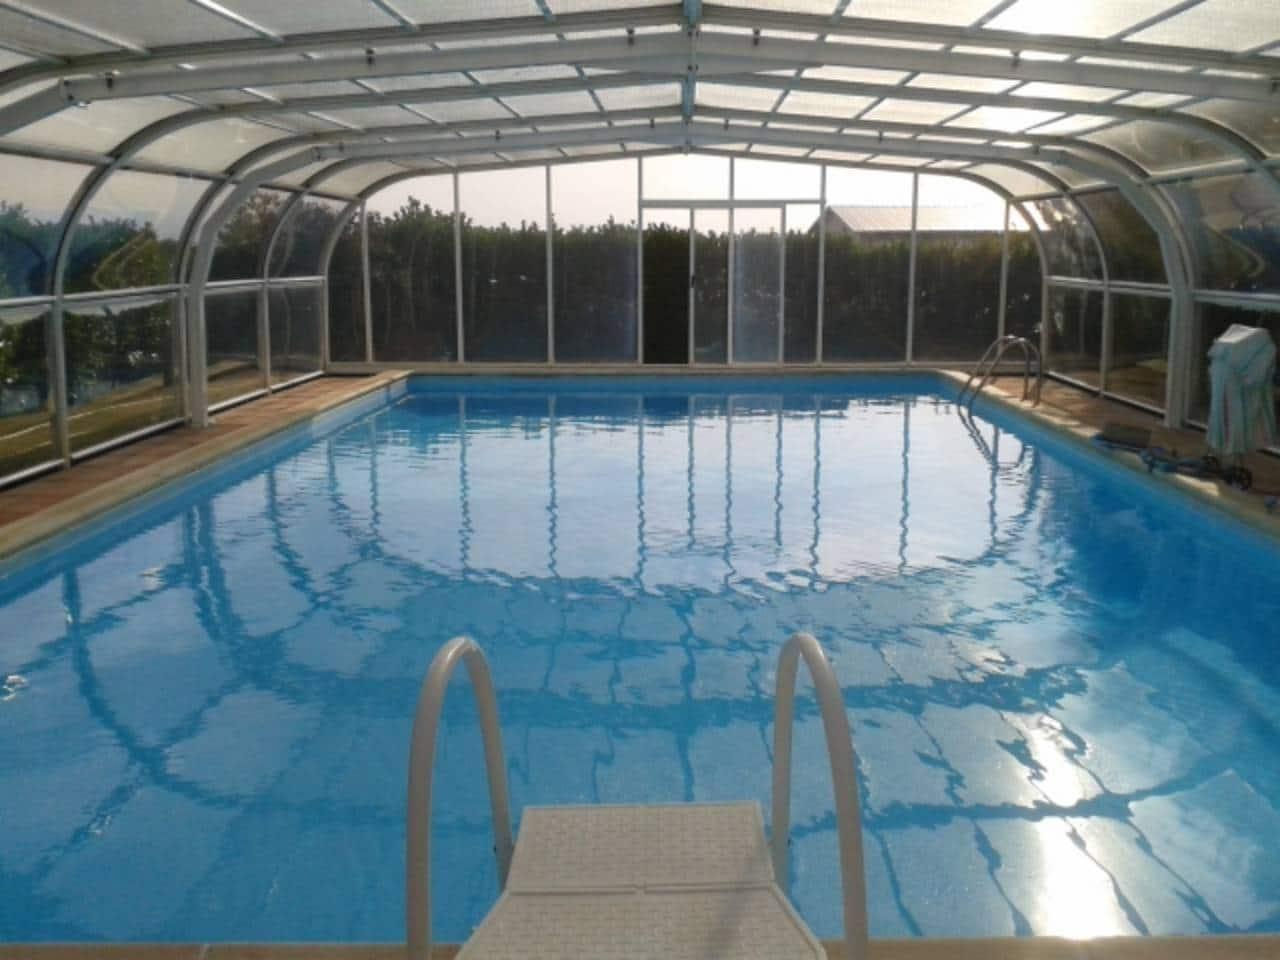 5 chambre Villa/Maison à vendre à Labastida avec piscine garage - 620 000 € (Ref: 3861873)